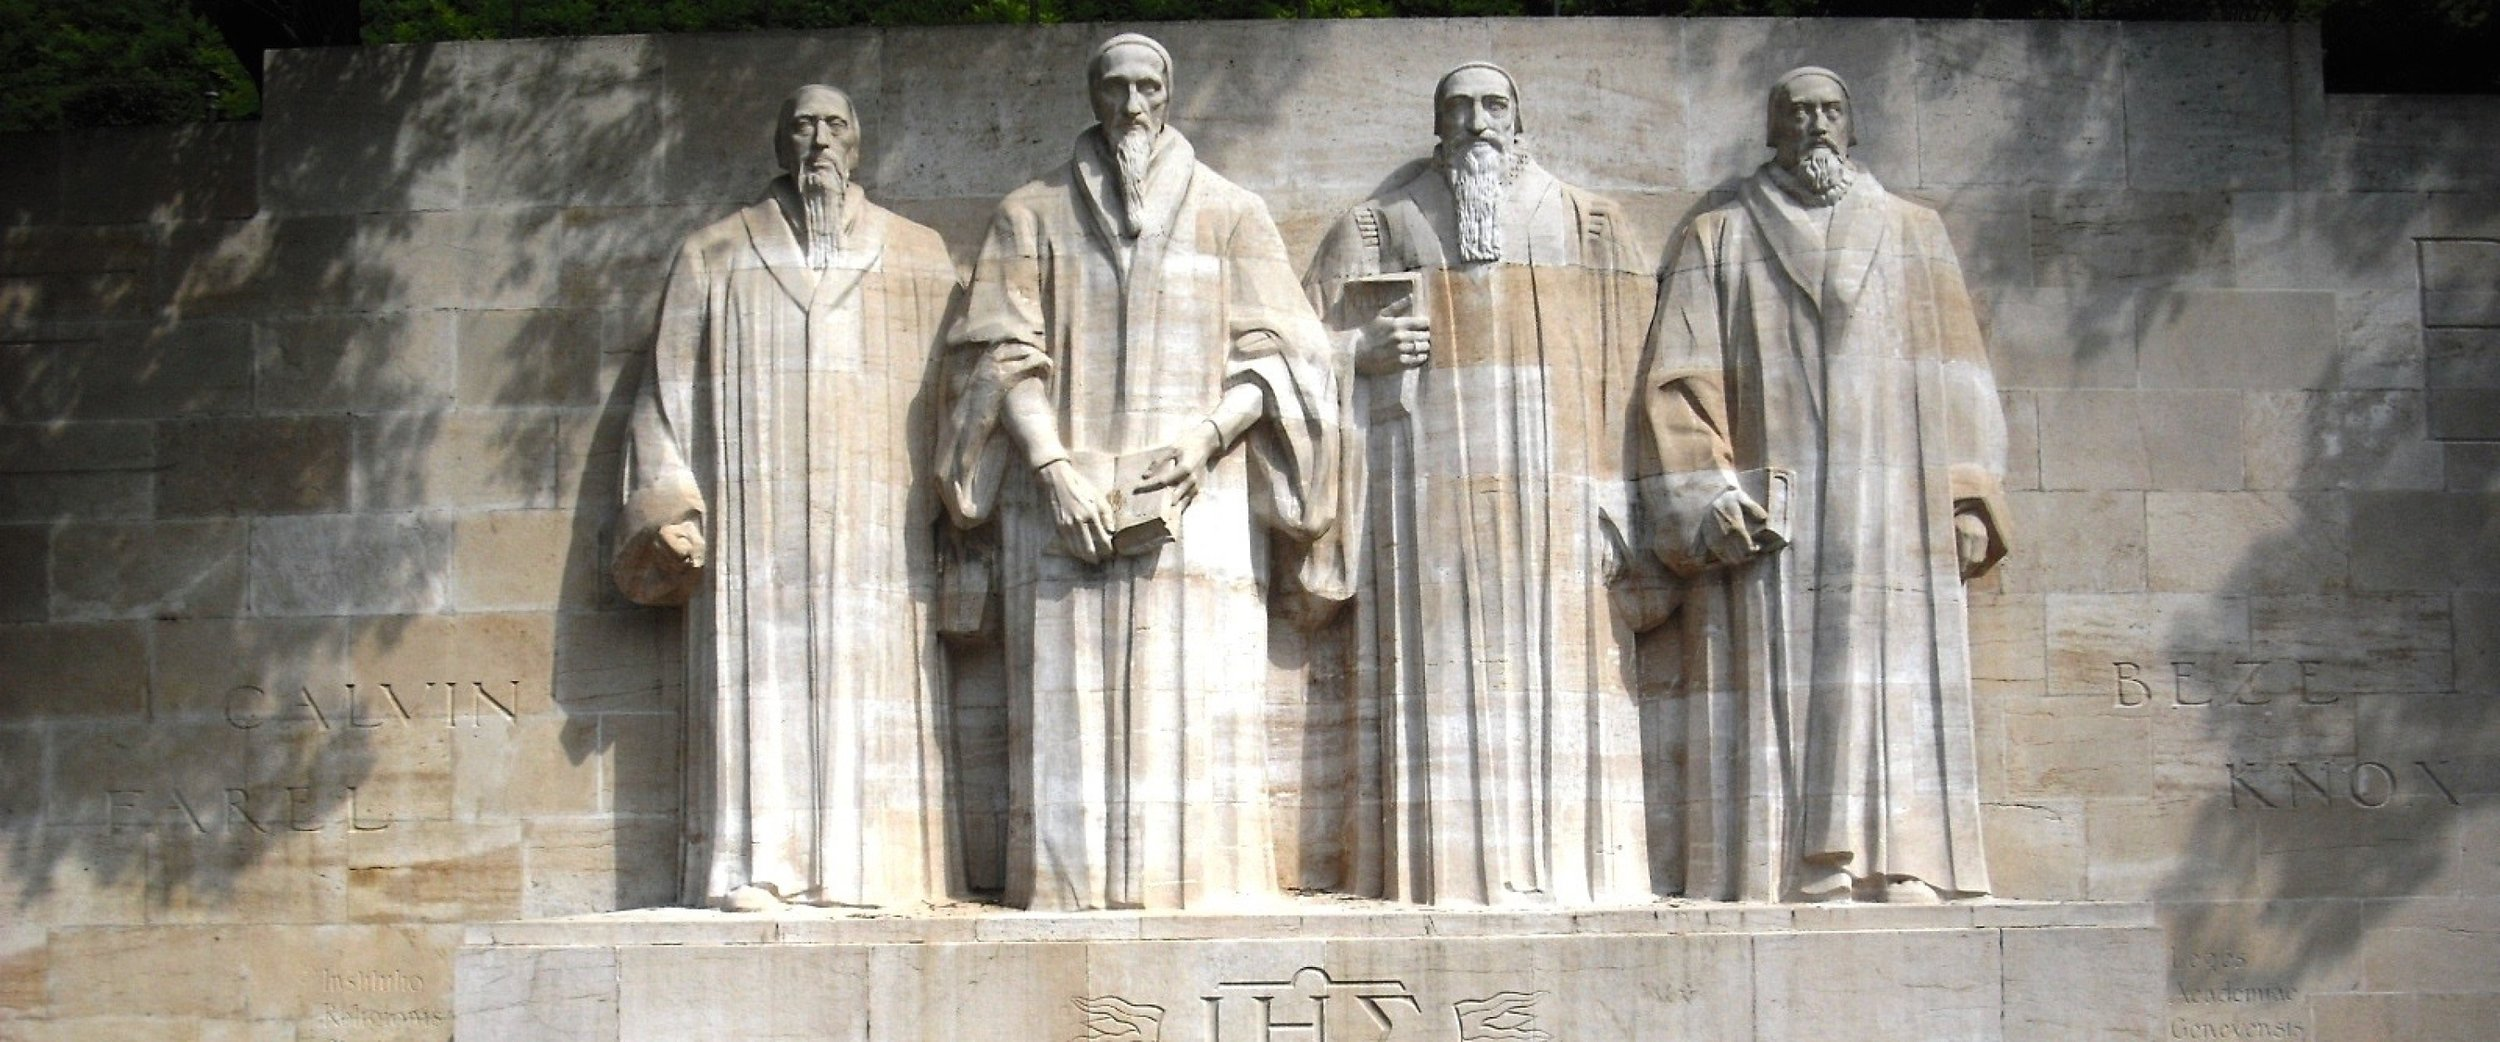 "International Monument to the Reformation (""Reformation Wall""), Geneva, Switzerland."